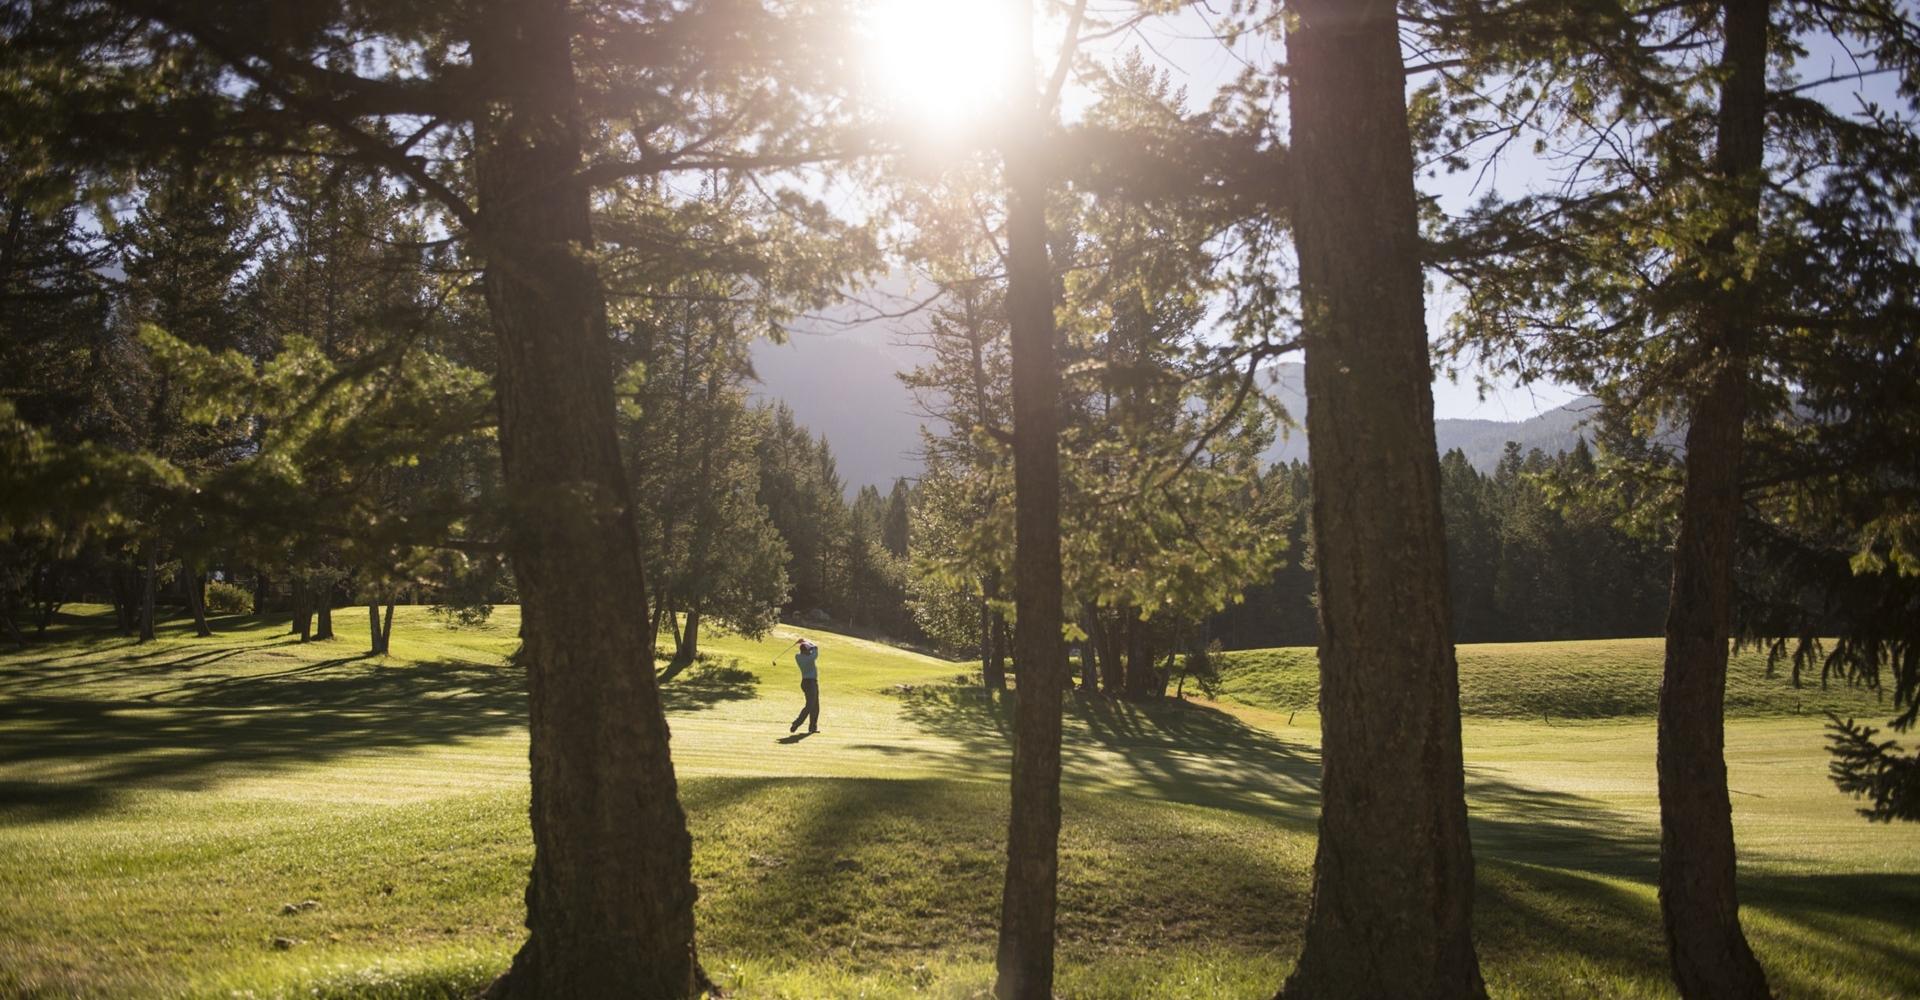 Golfing at Fairmont Hot Springs | Kari Medig